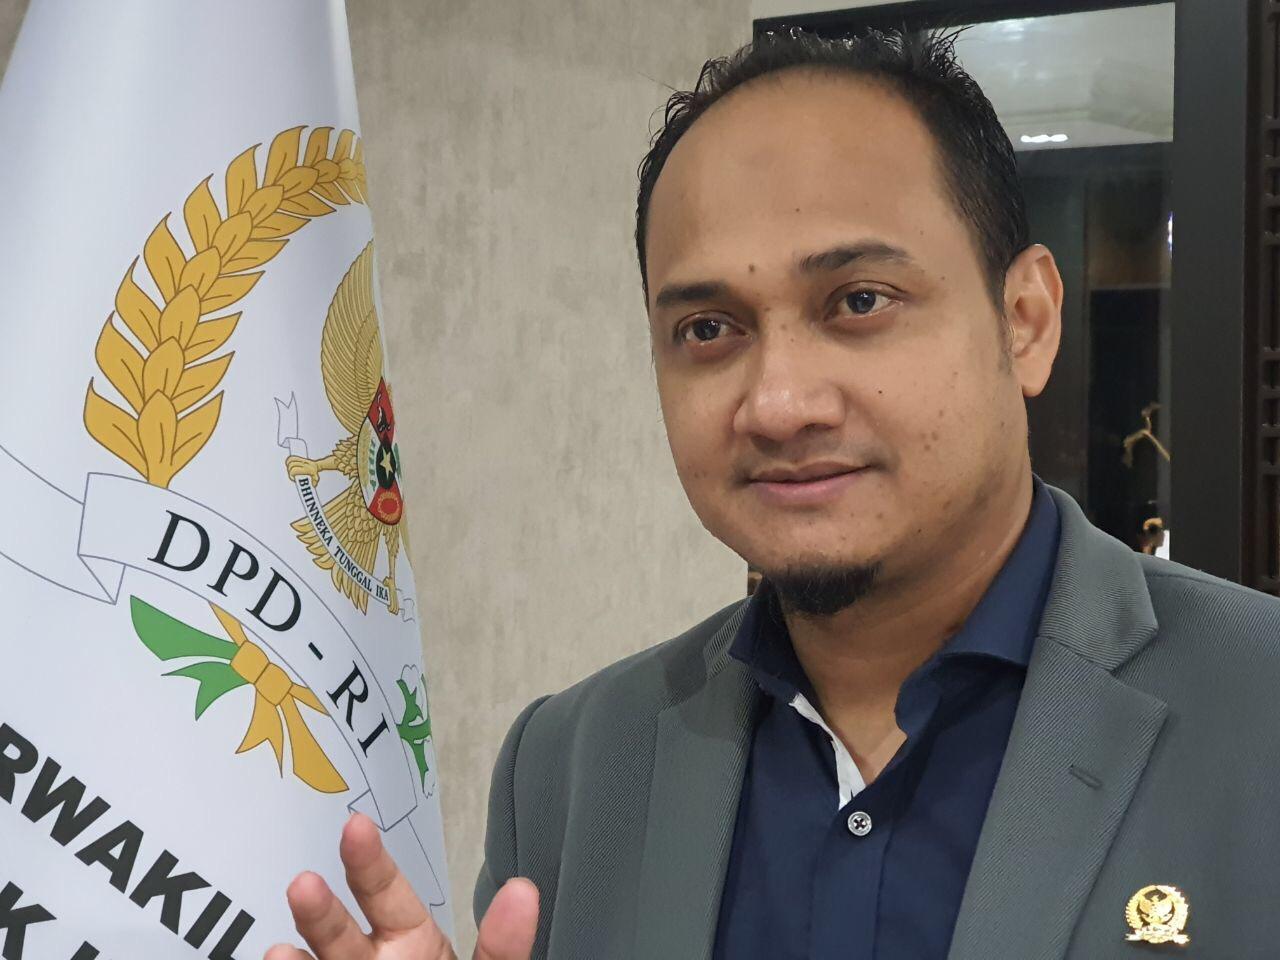 Fachrul Razi : Selain Teknologi, Pemuda Harus Miliki Spiritual Leadership